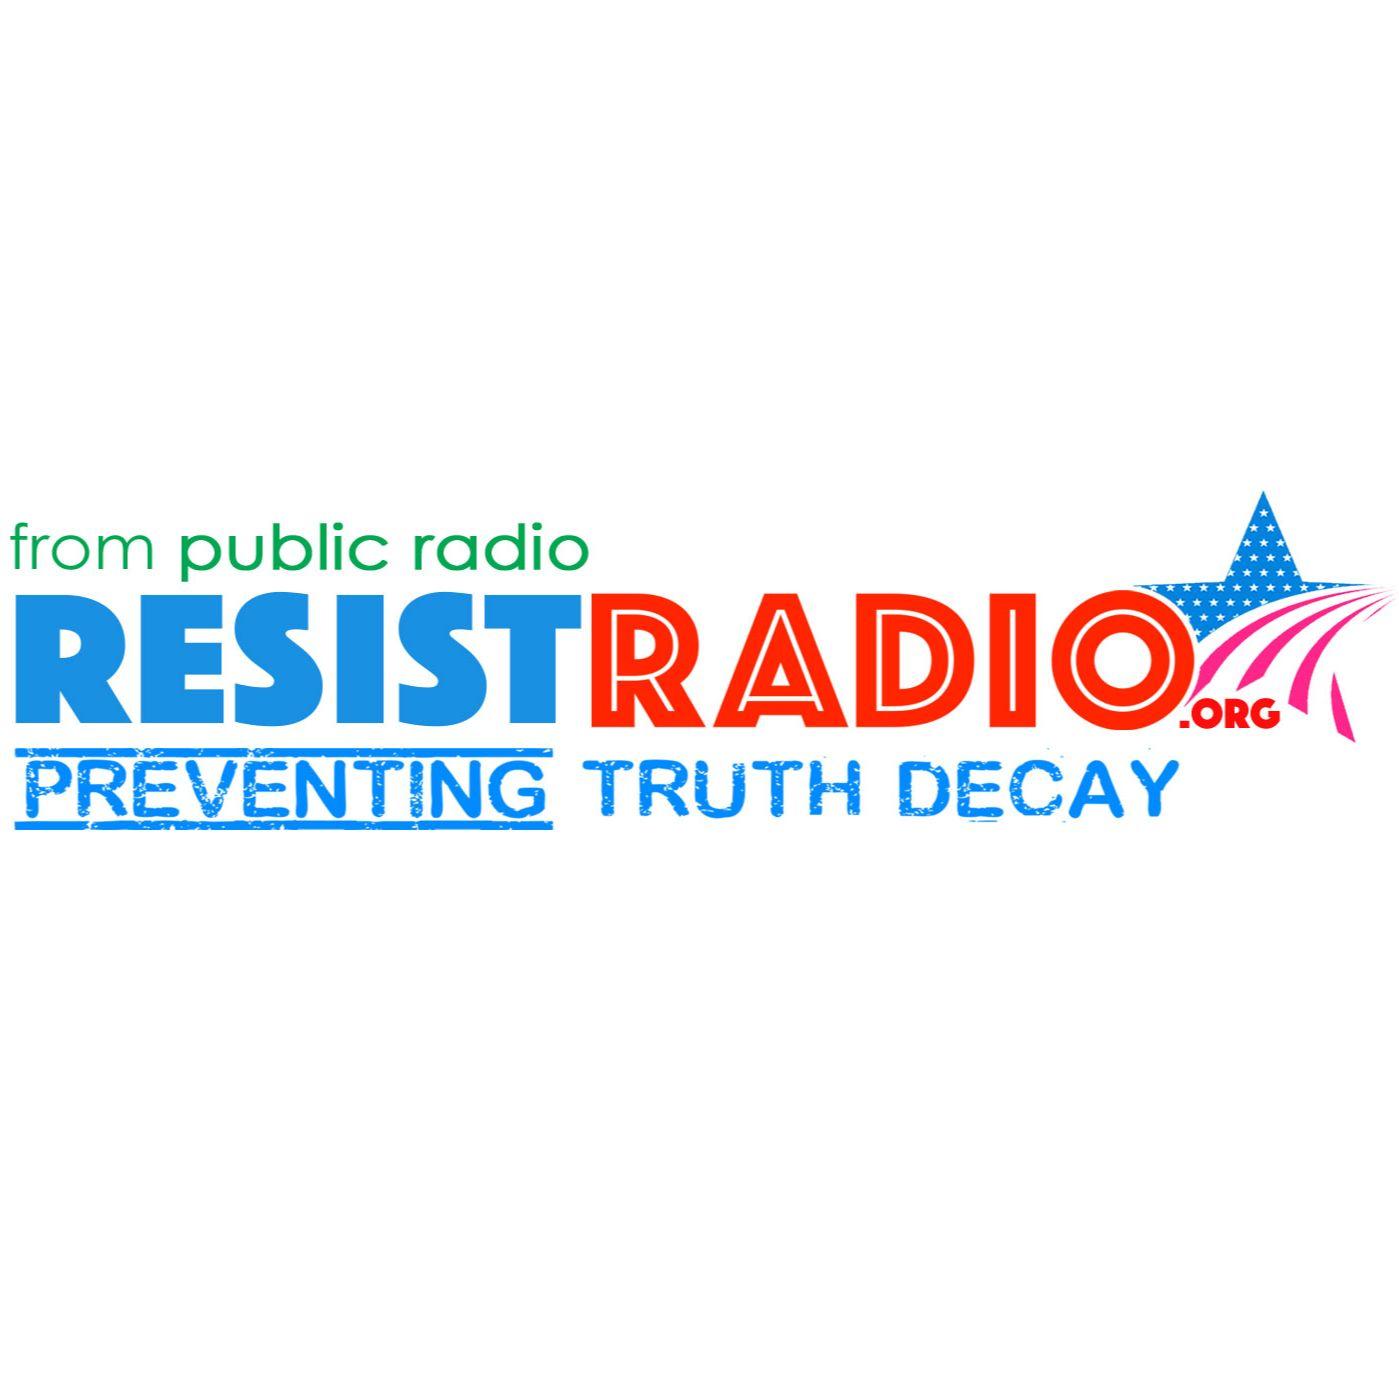 Resist Radio Trailer(3 Mins)